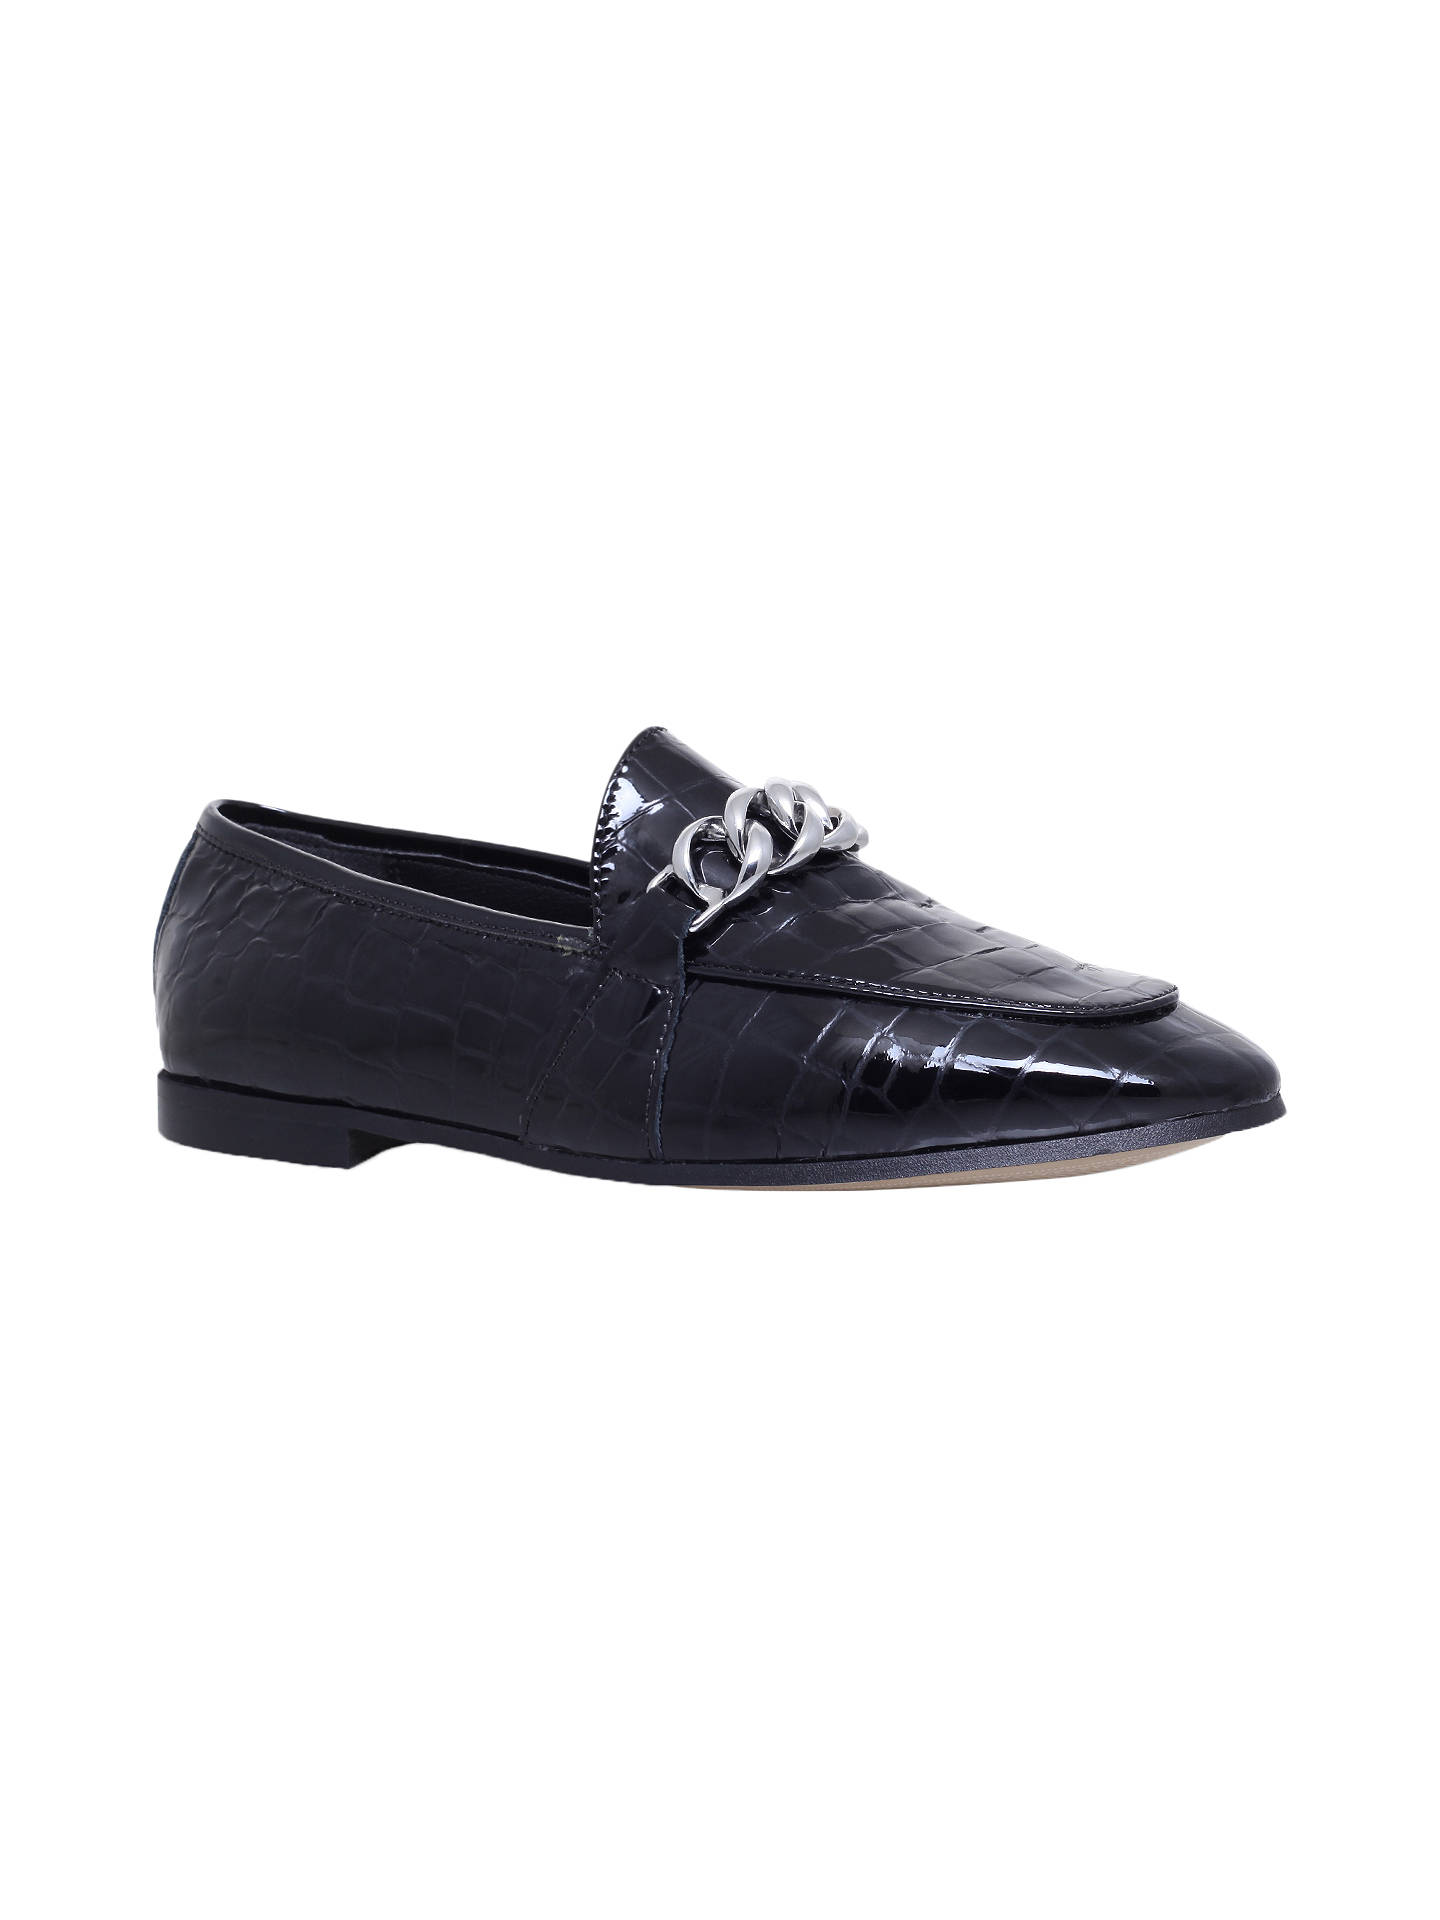 3ccb0f8510b Buy KG by Kurt Geiger Kenzie Chain Loafers